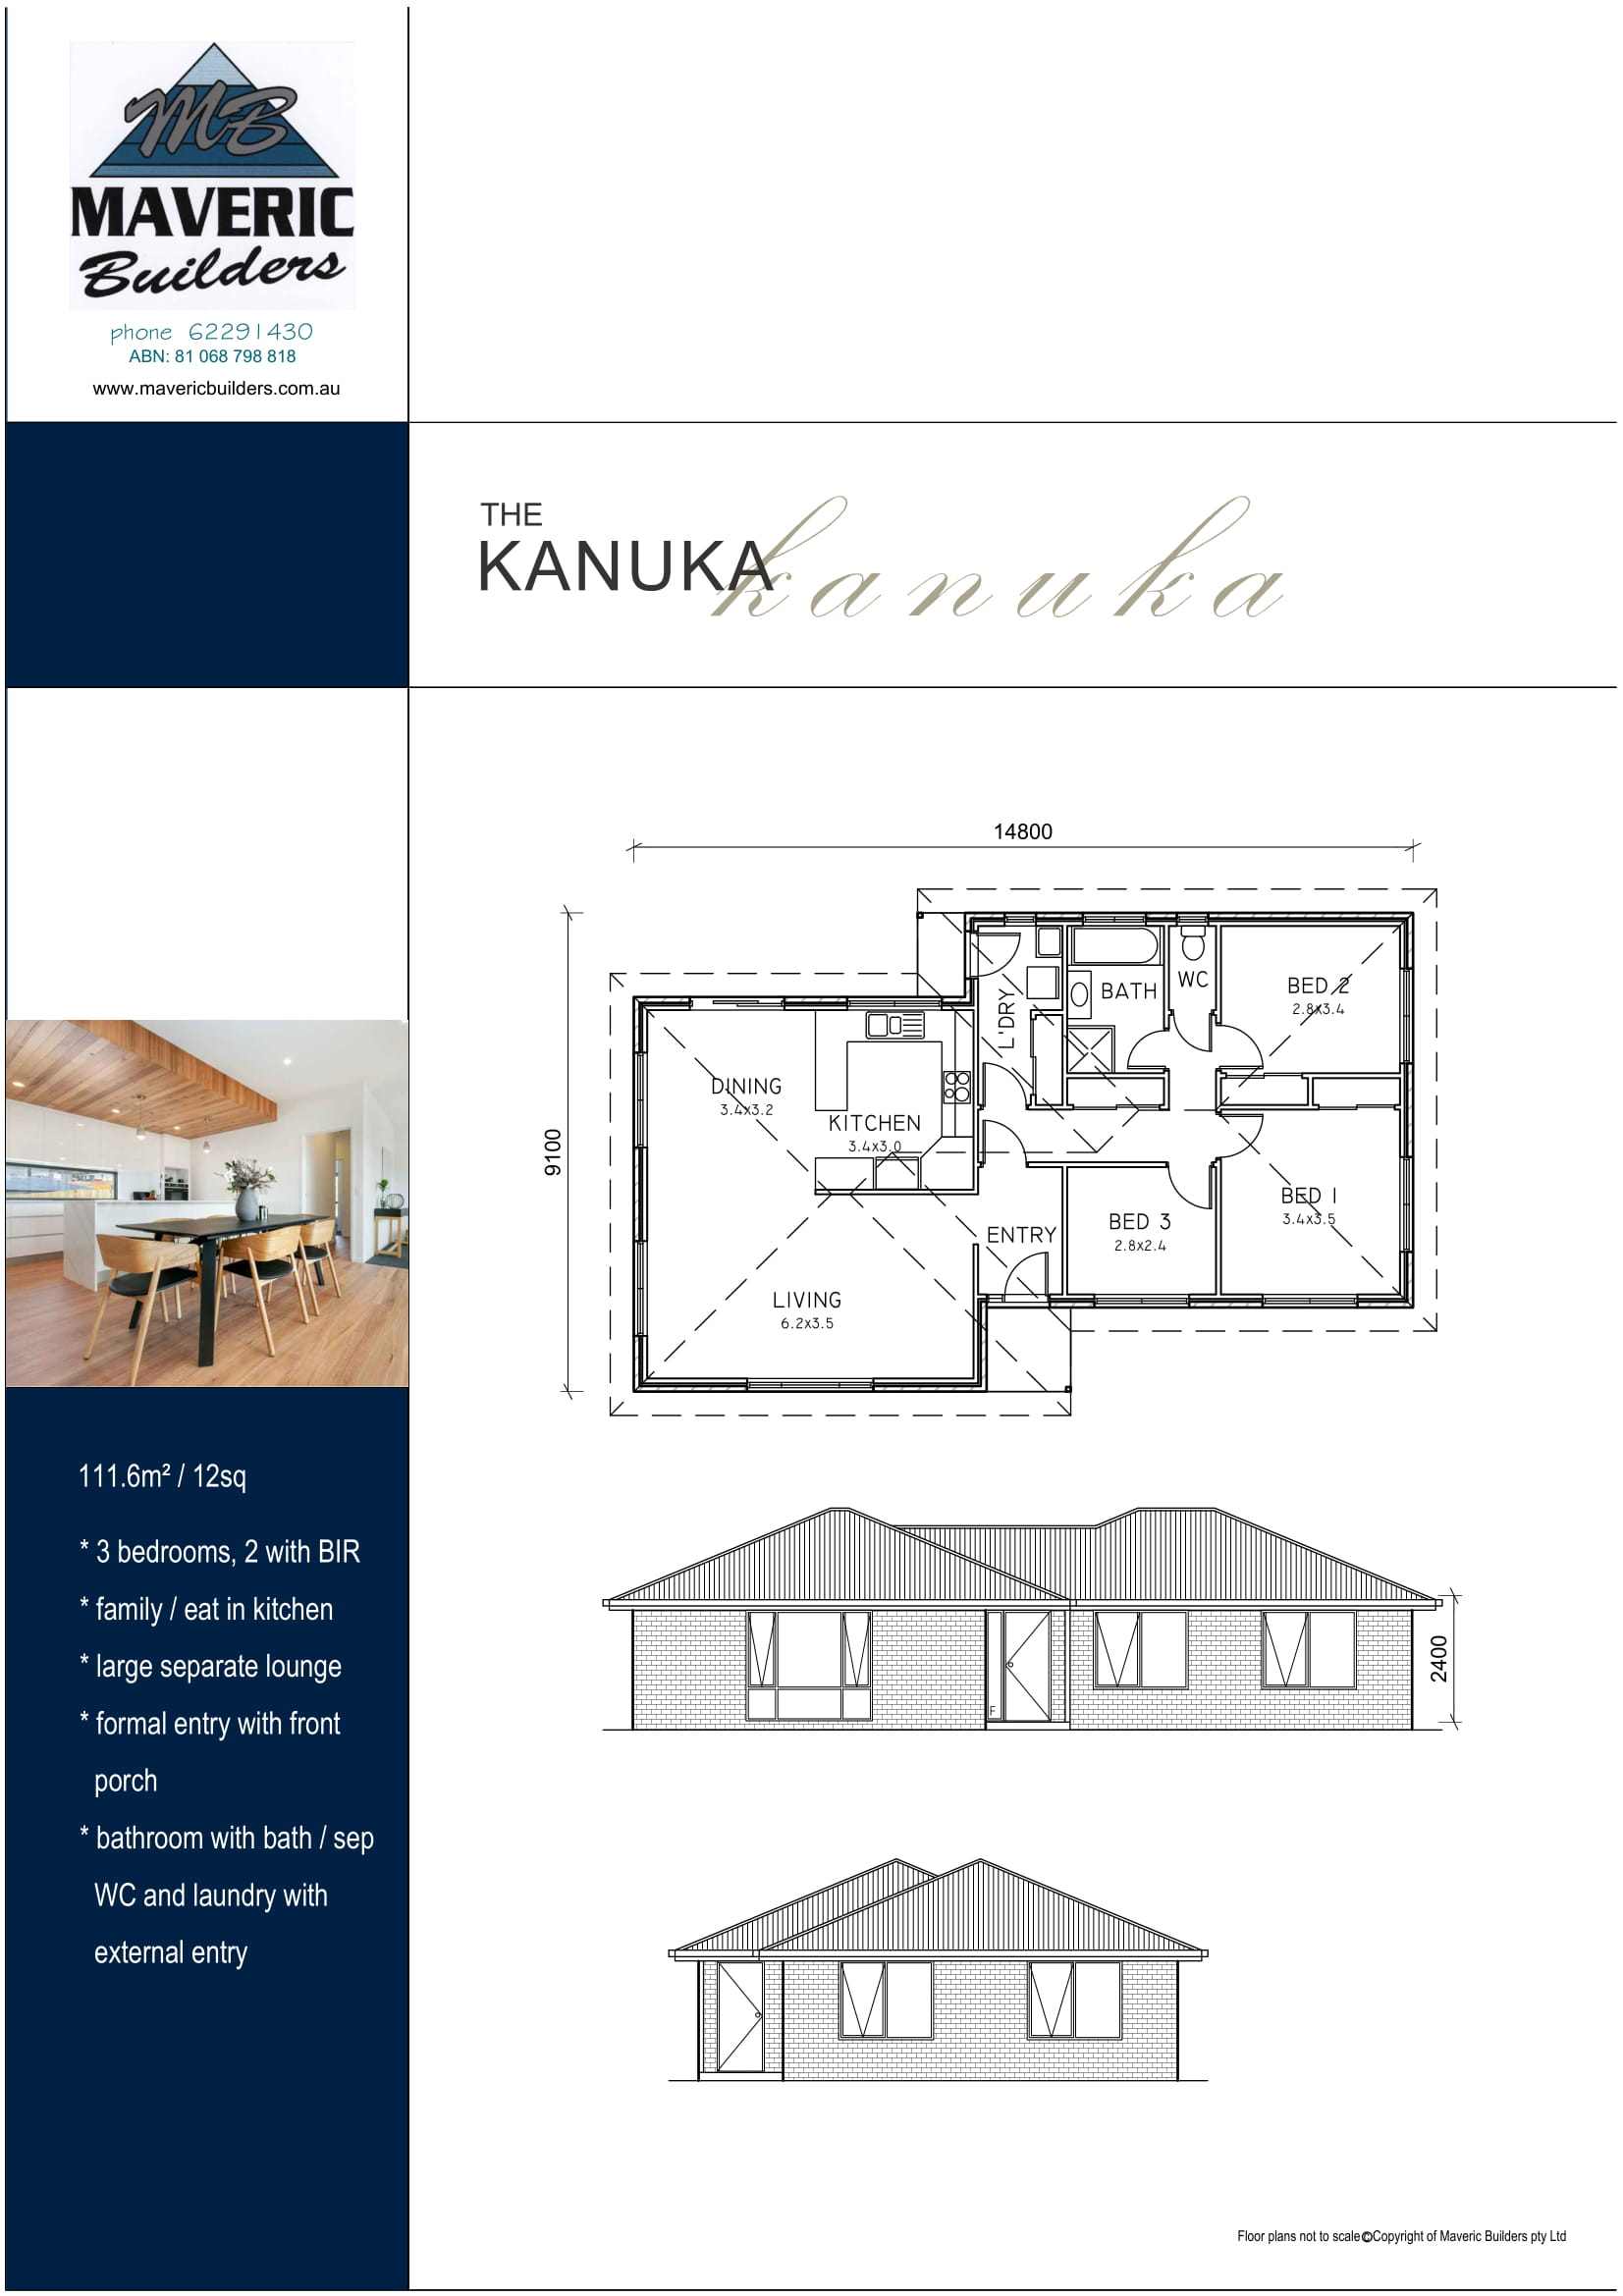 A4 Brochures 2019 01 - 24-04.jpg